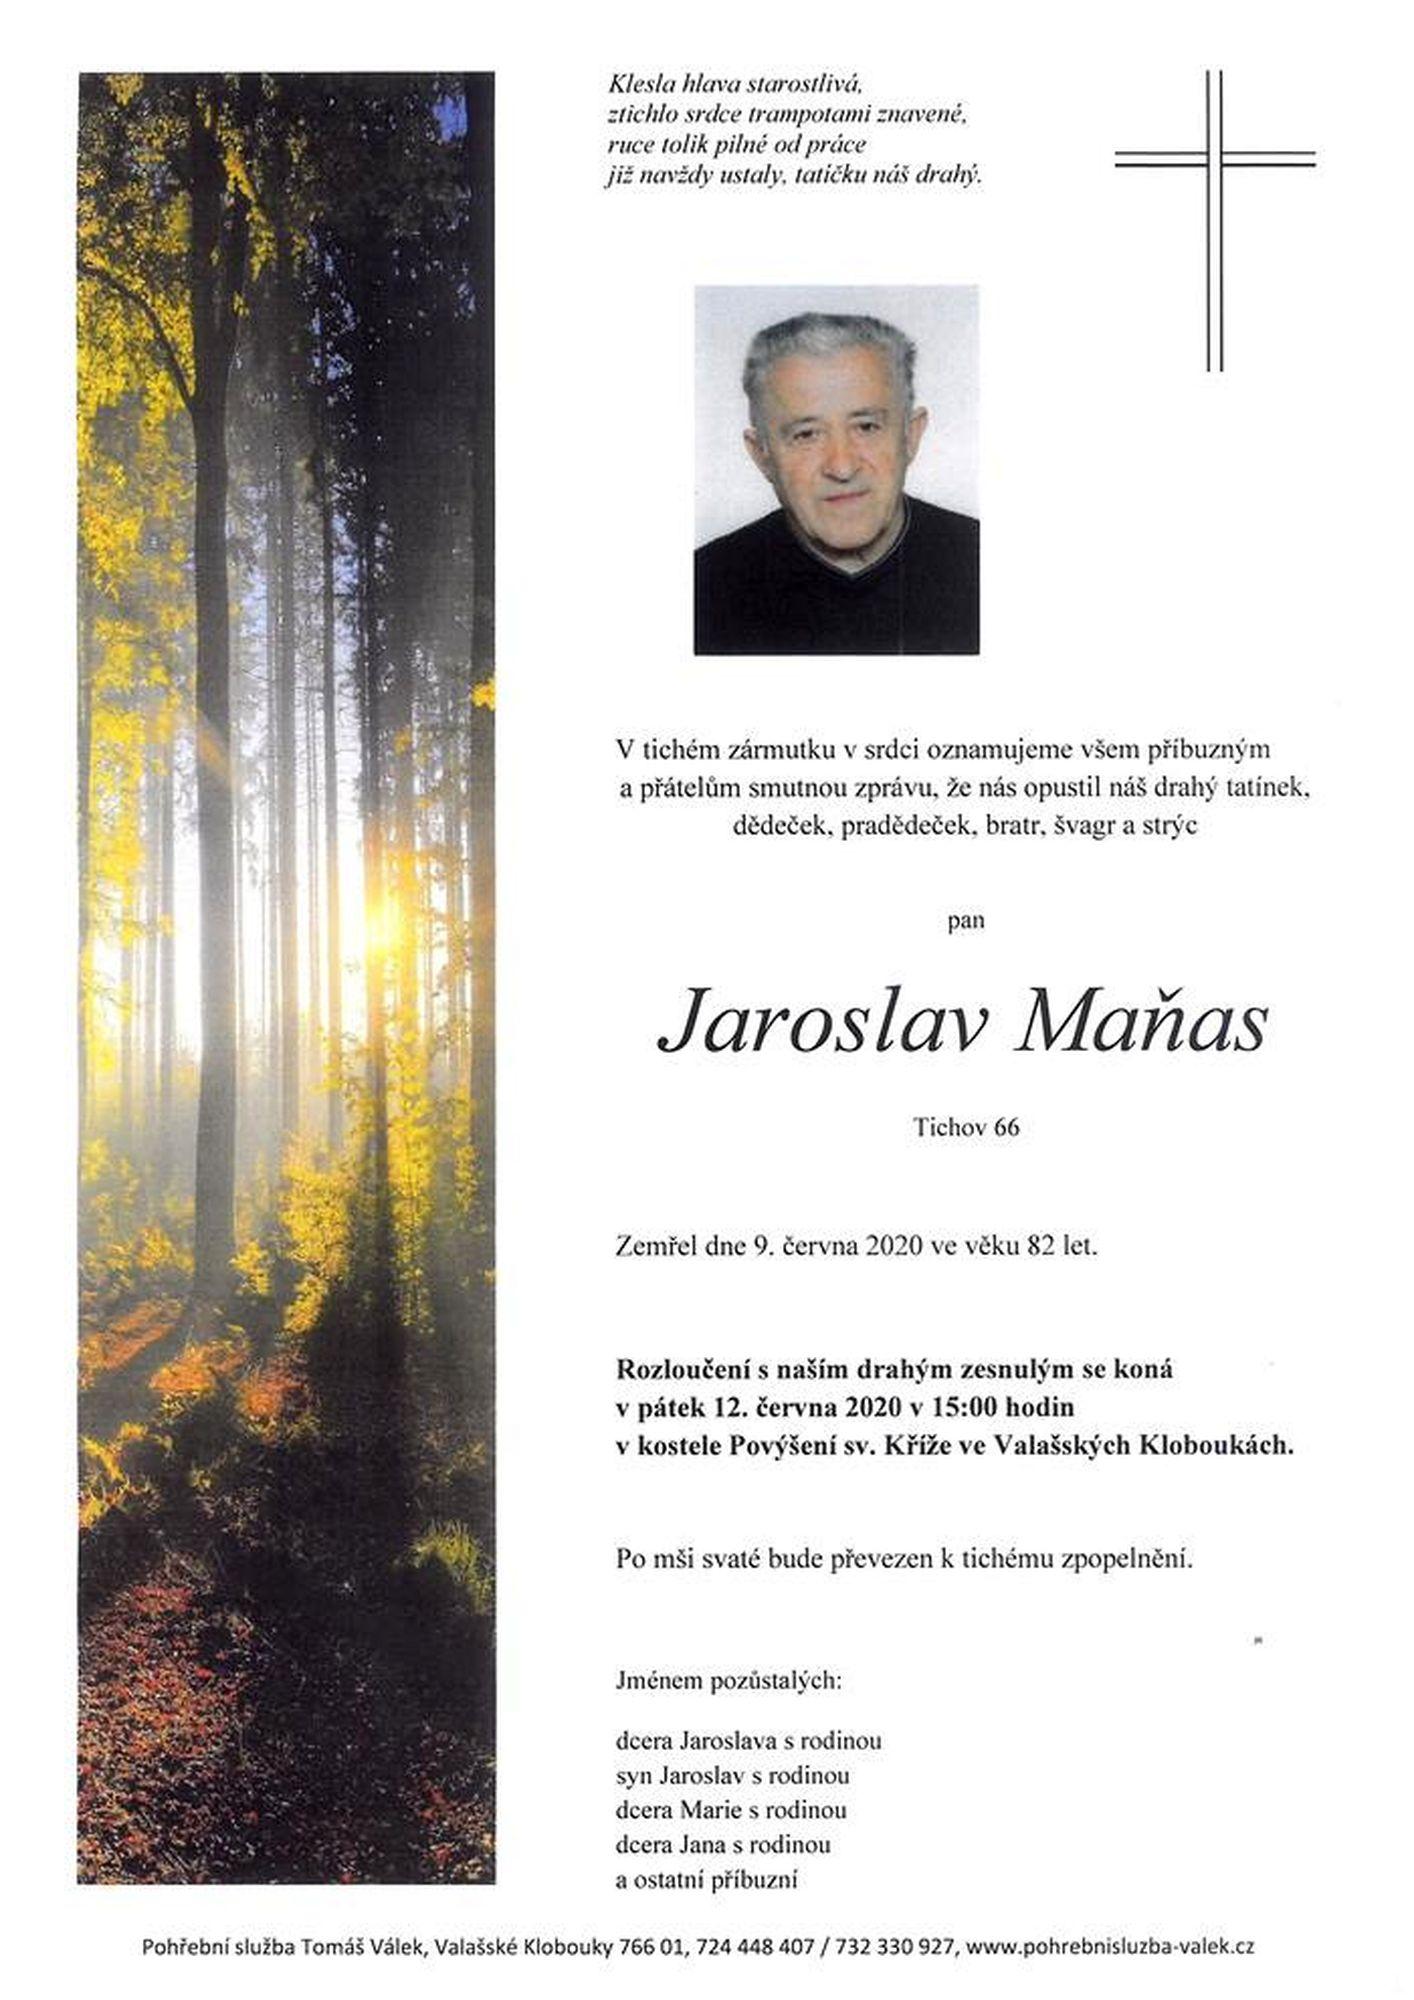 Jaroslav Maňas